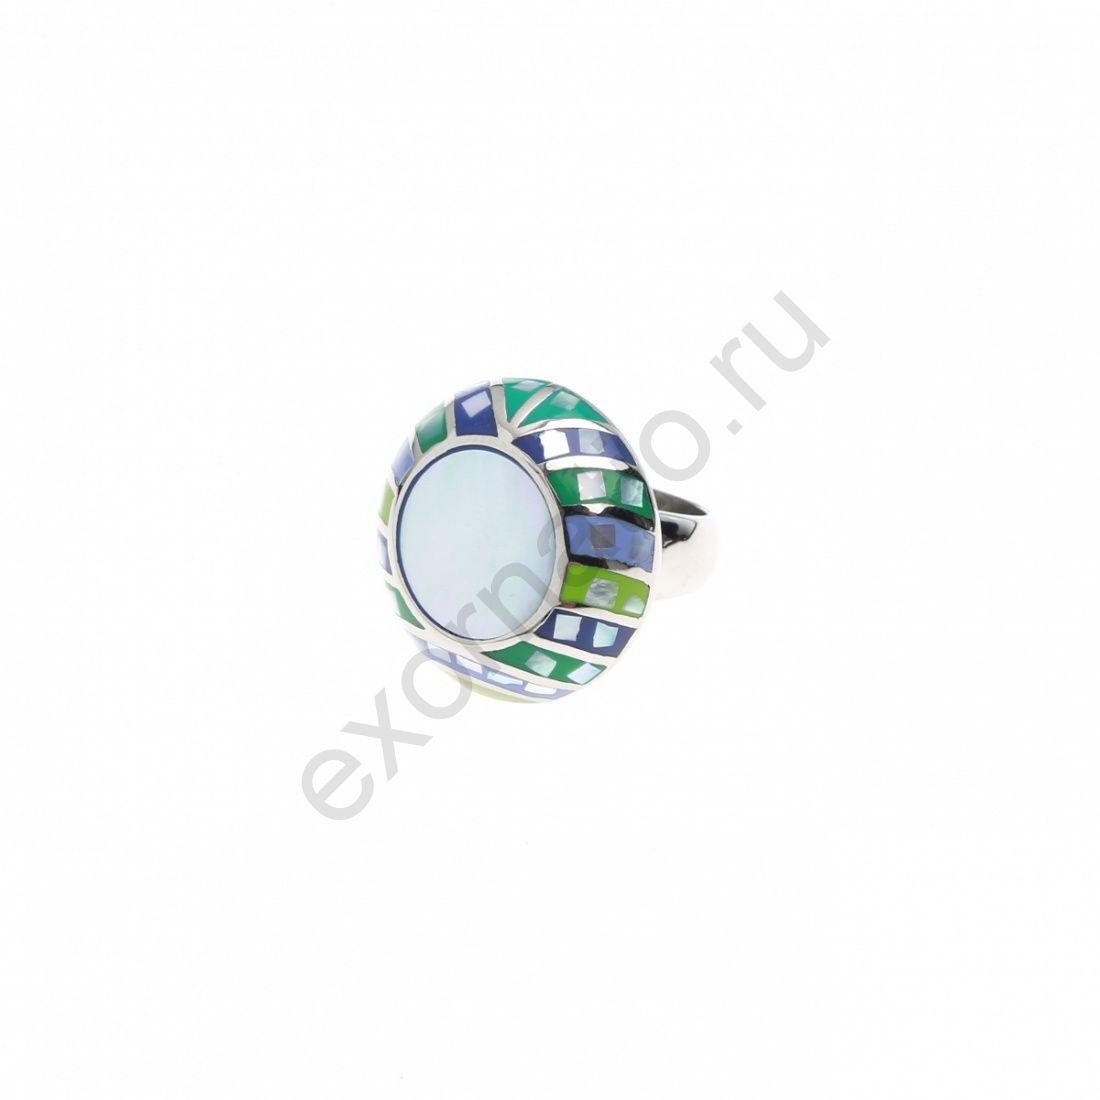 Кольцо Fiore Luna KR01359-3 G